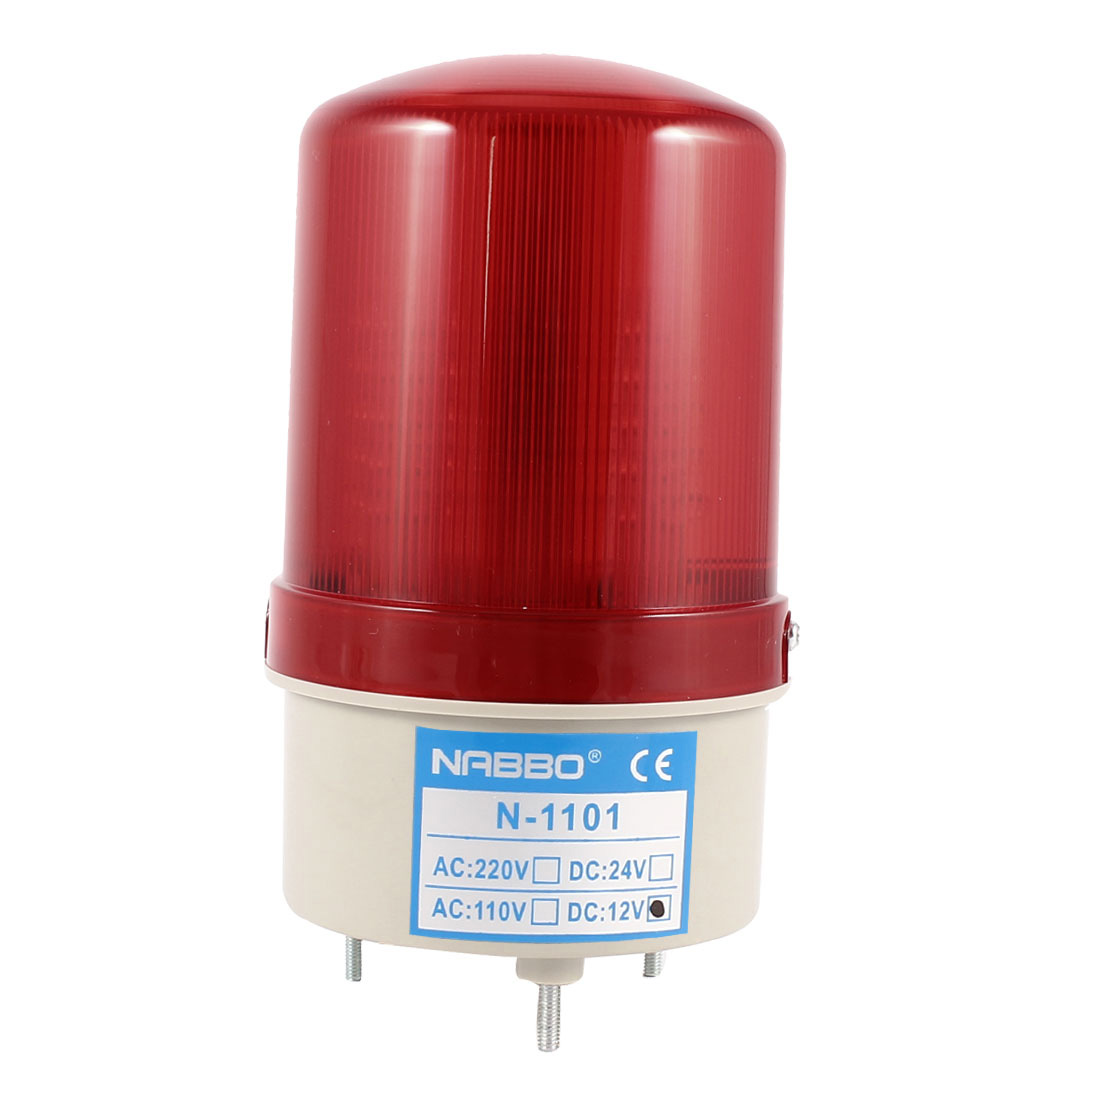 Industrial DC 12V Red LED Blinking Rotating Warning Light Bulb Signal Tower Lamp